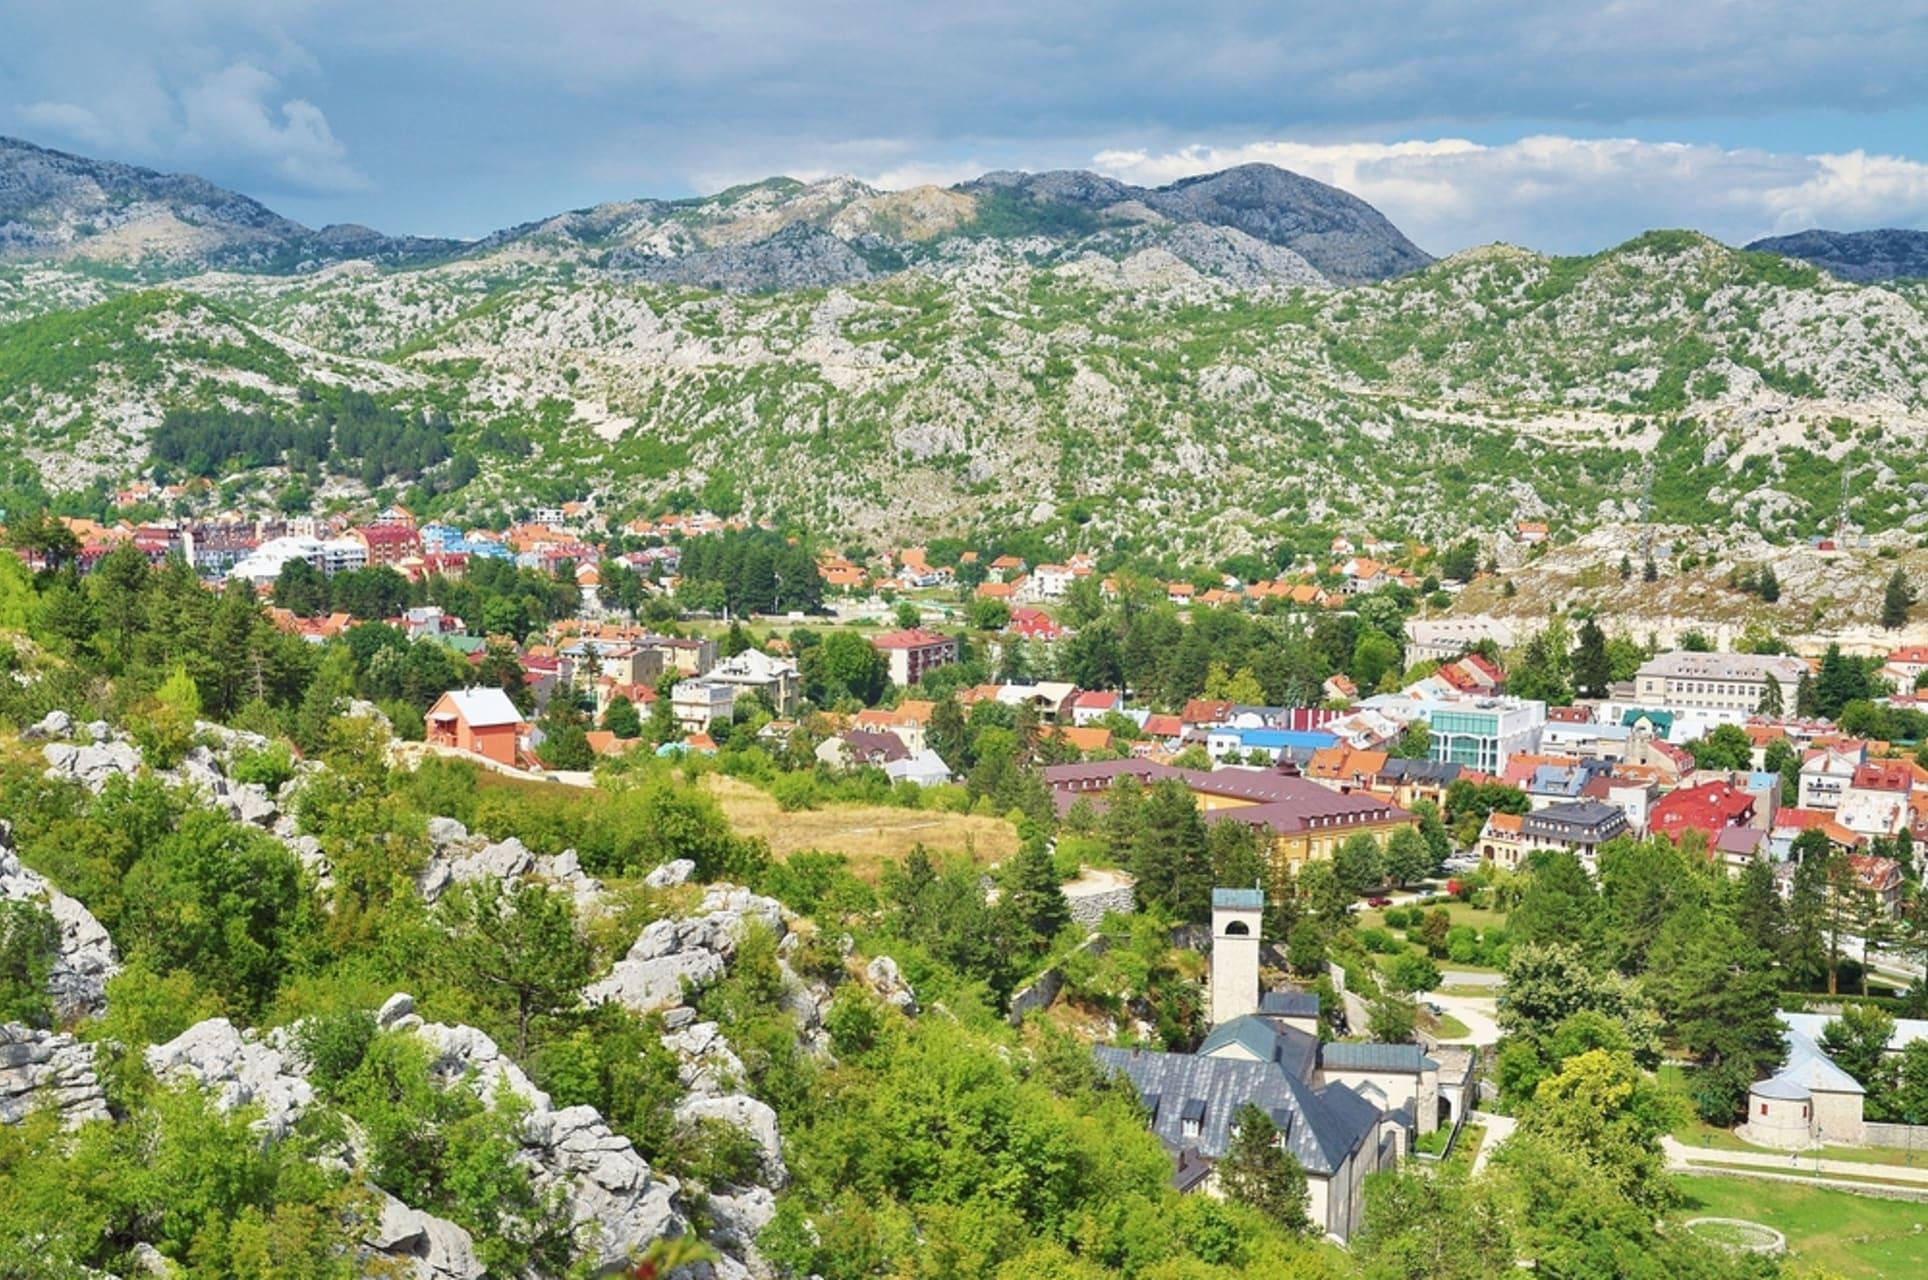 Cetinje cover image